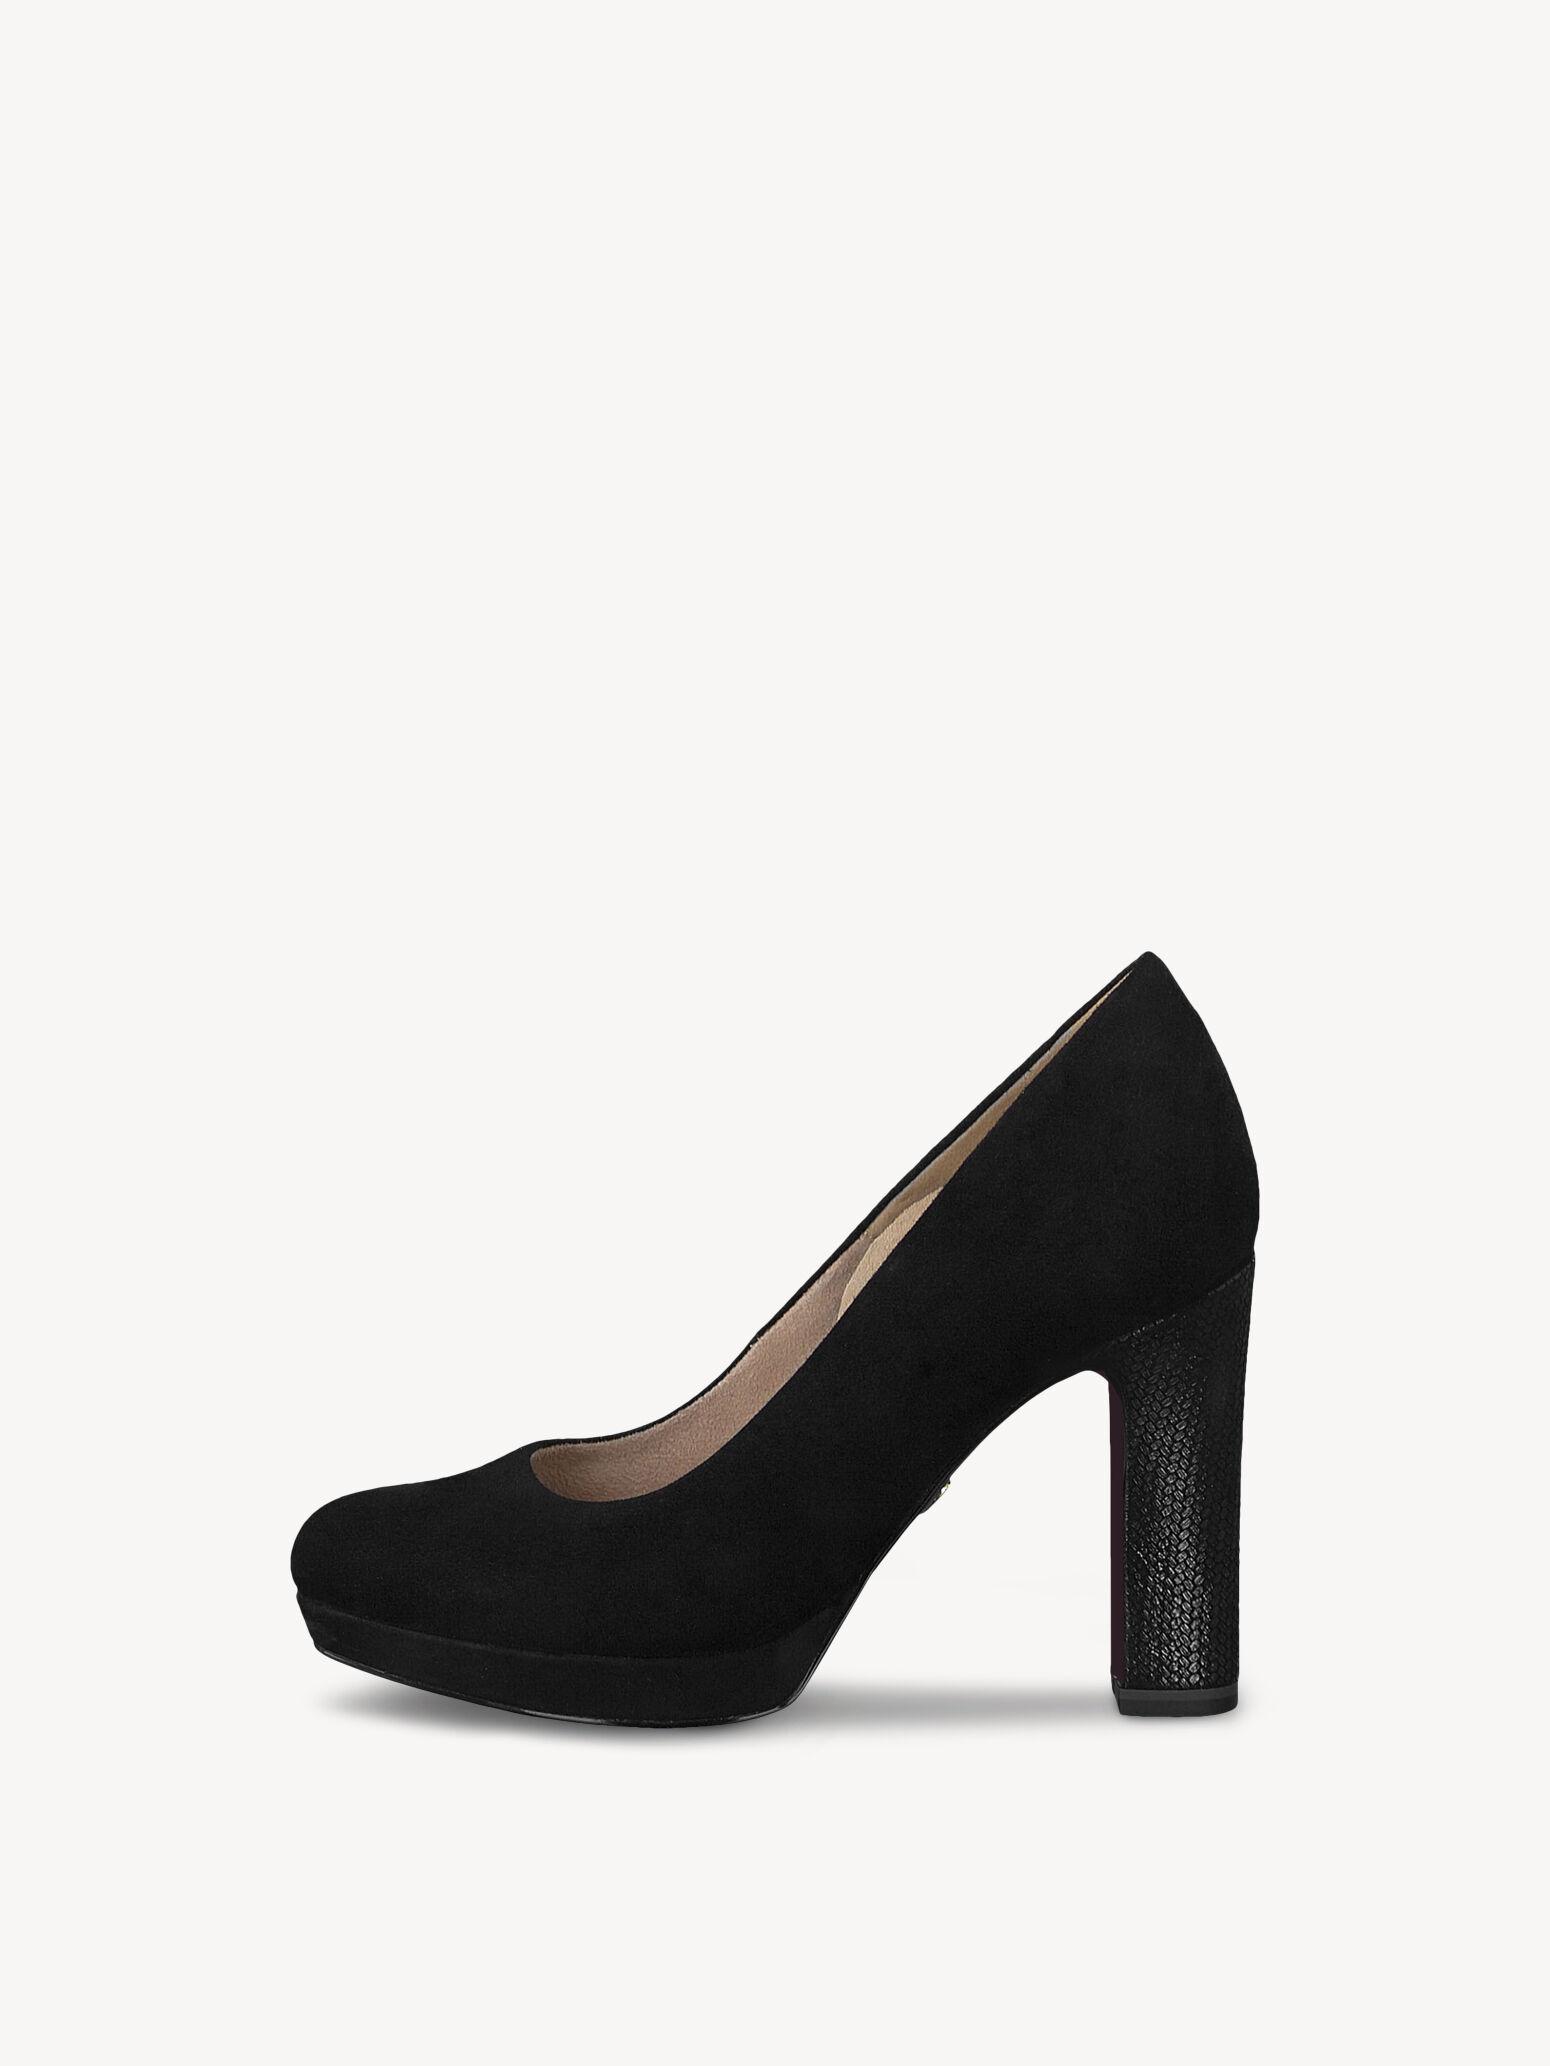 Femmes Tamaris Tamaris Hauts Hauts Hauts Femmes Talons Talons Talons Chaussures Chaussures UzMVqSGp